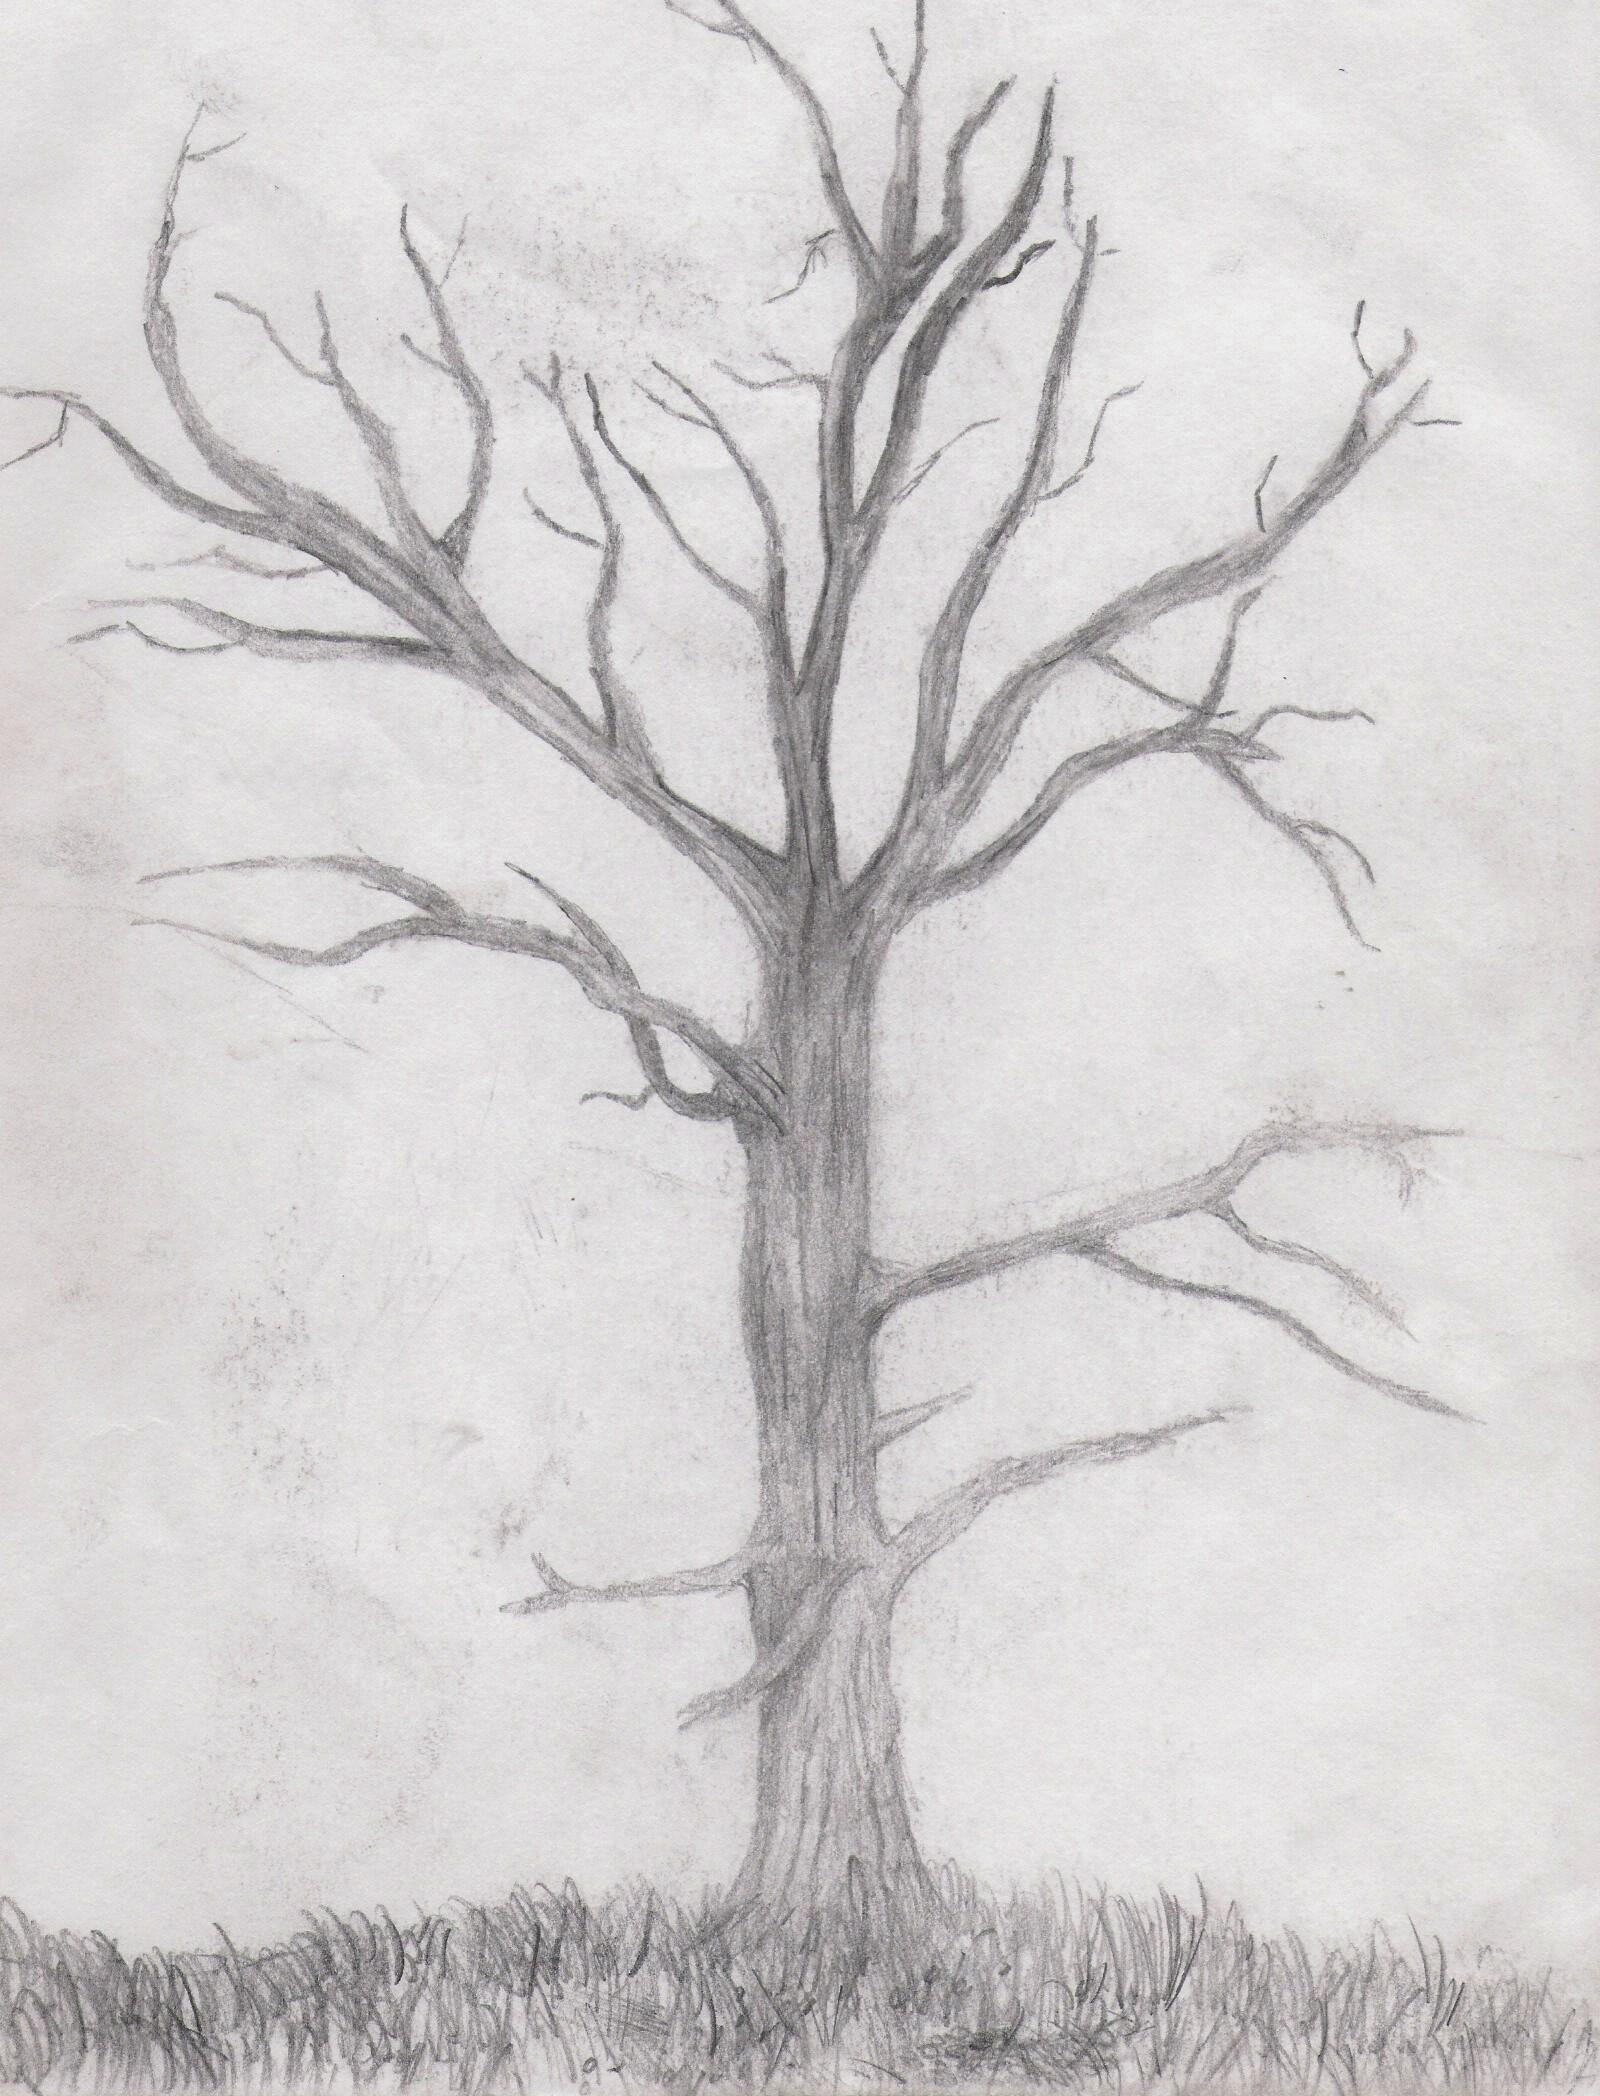 Drawn dead tree Tree Nic1675 DeviantArt Nic1675 Dead